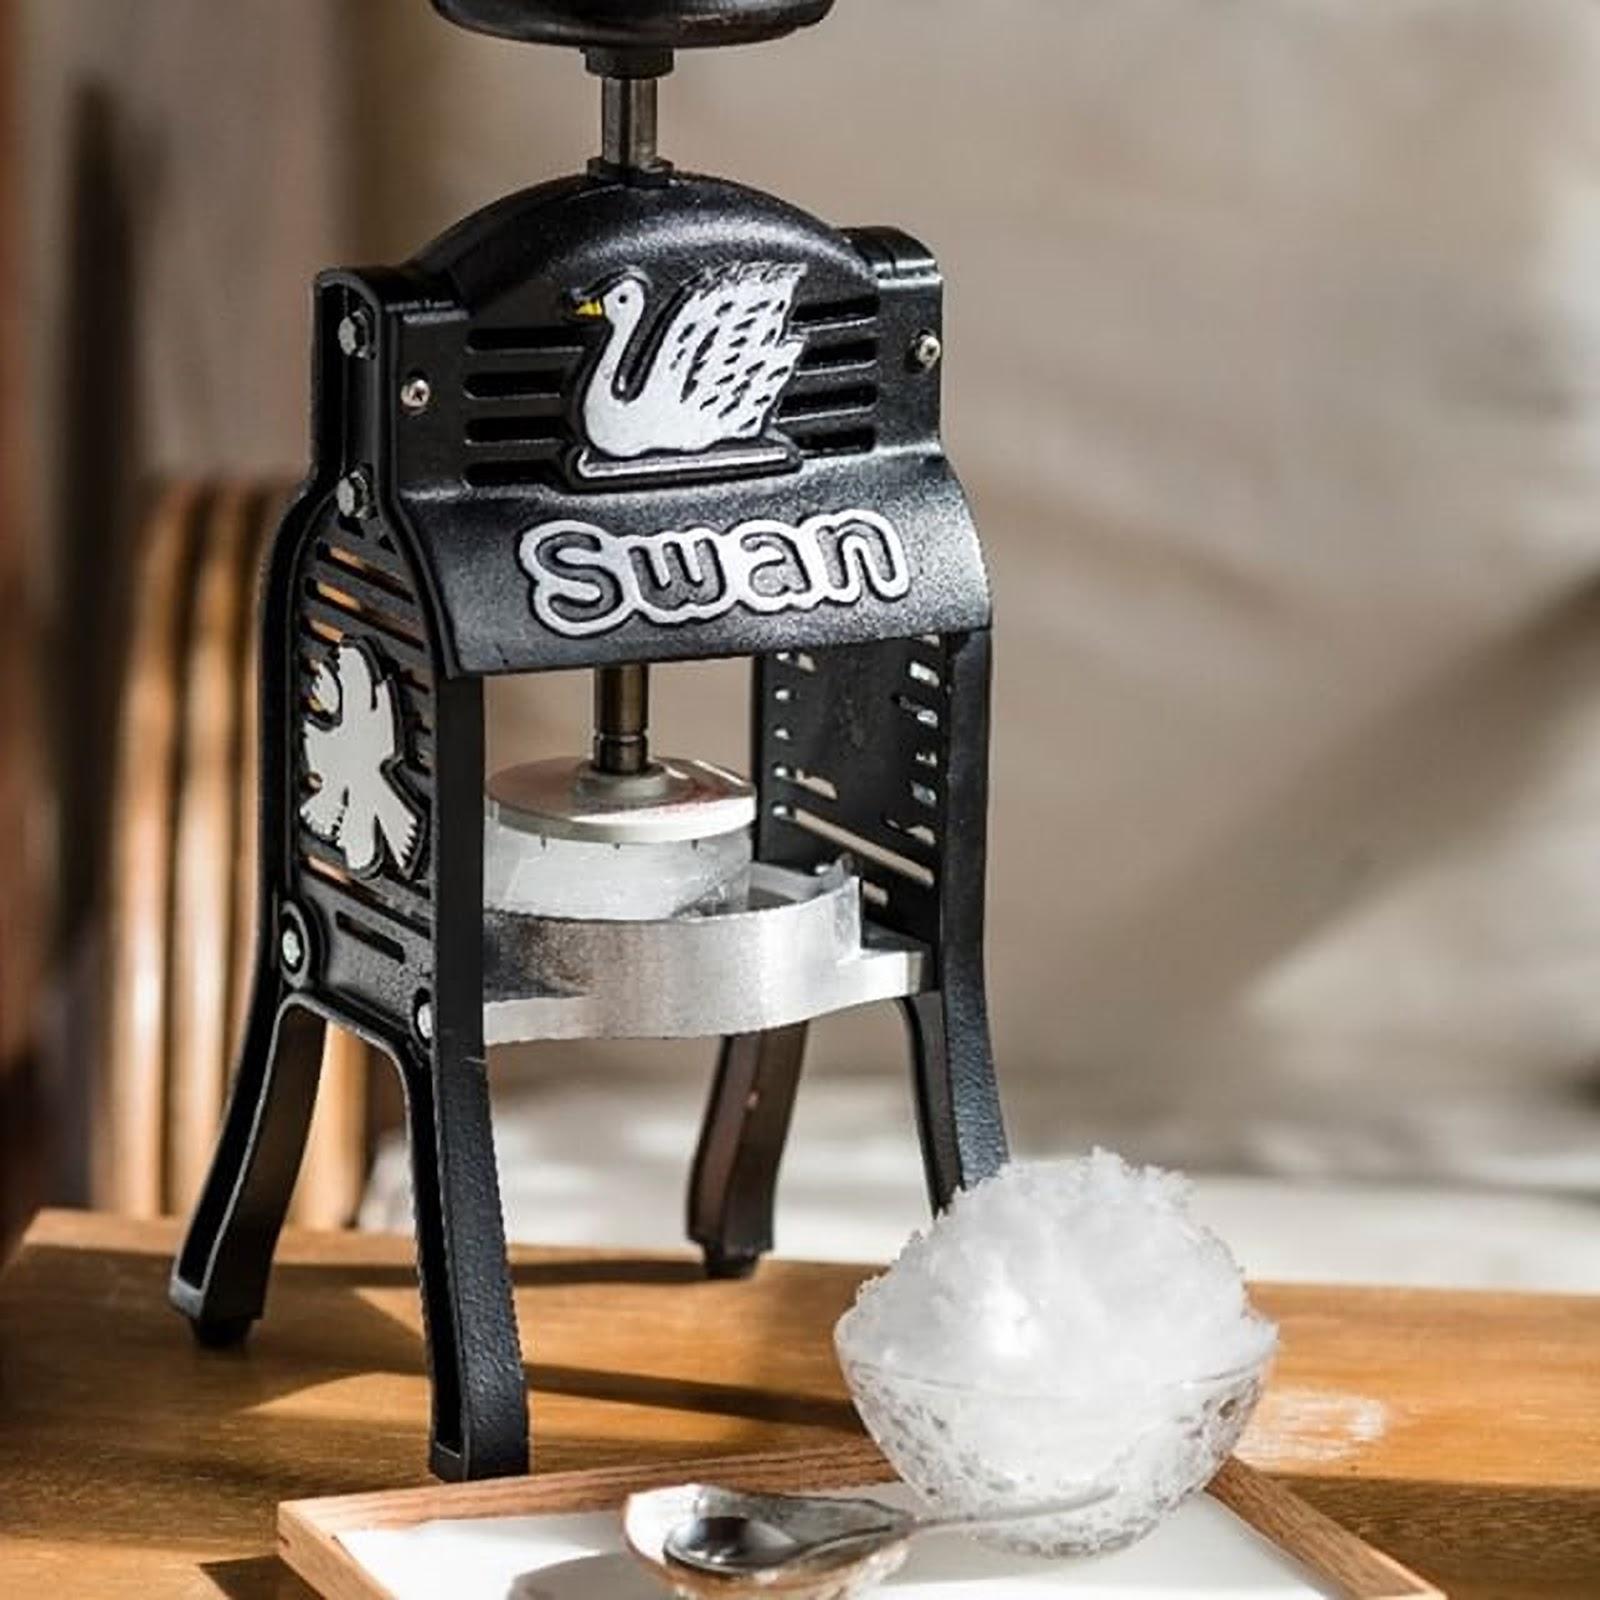 Swan鵝牌極致鵝絨日式刨冰 鵝絨雪花冰;  迷你小黑鵝:吸引目光的生財工具 適合行動市集、DIY體驗 產能質地耐用性遠高於hatsuyuki初雪-swan-kakigori-ice-shaving-machine-black-mini-TW